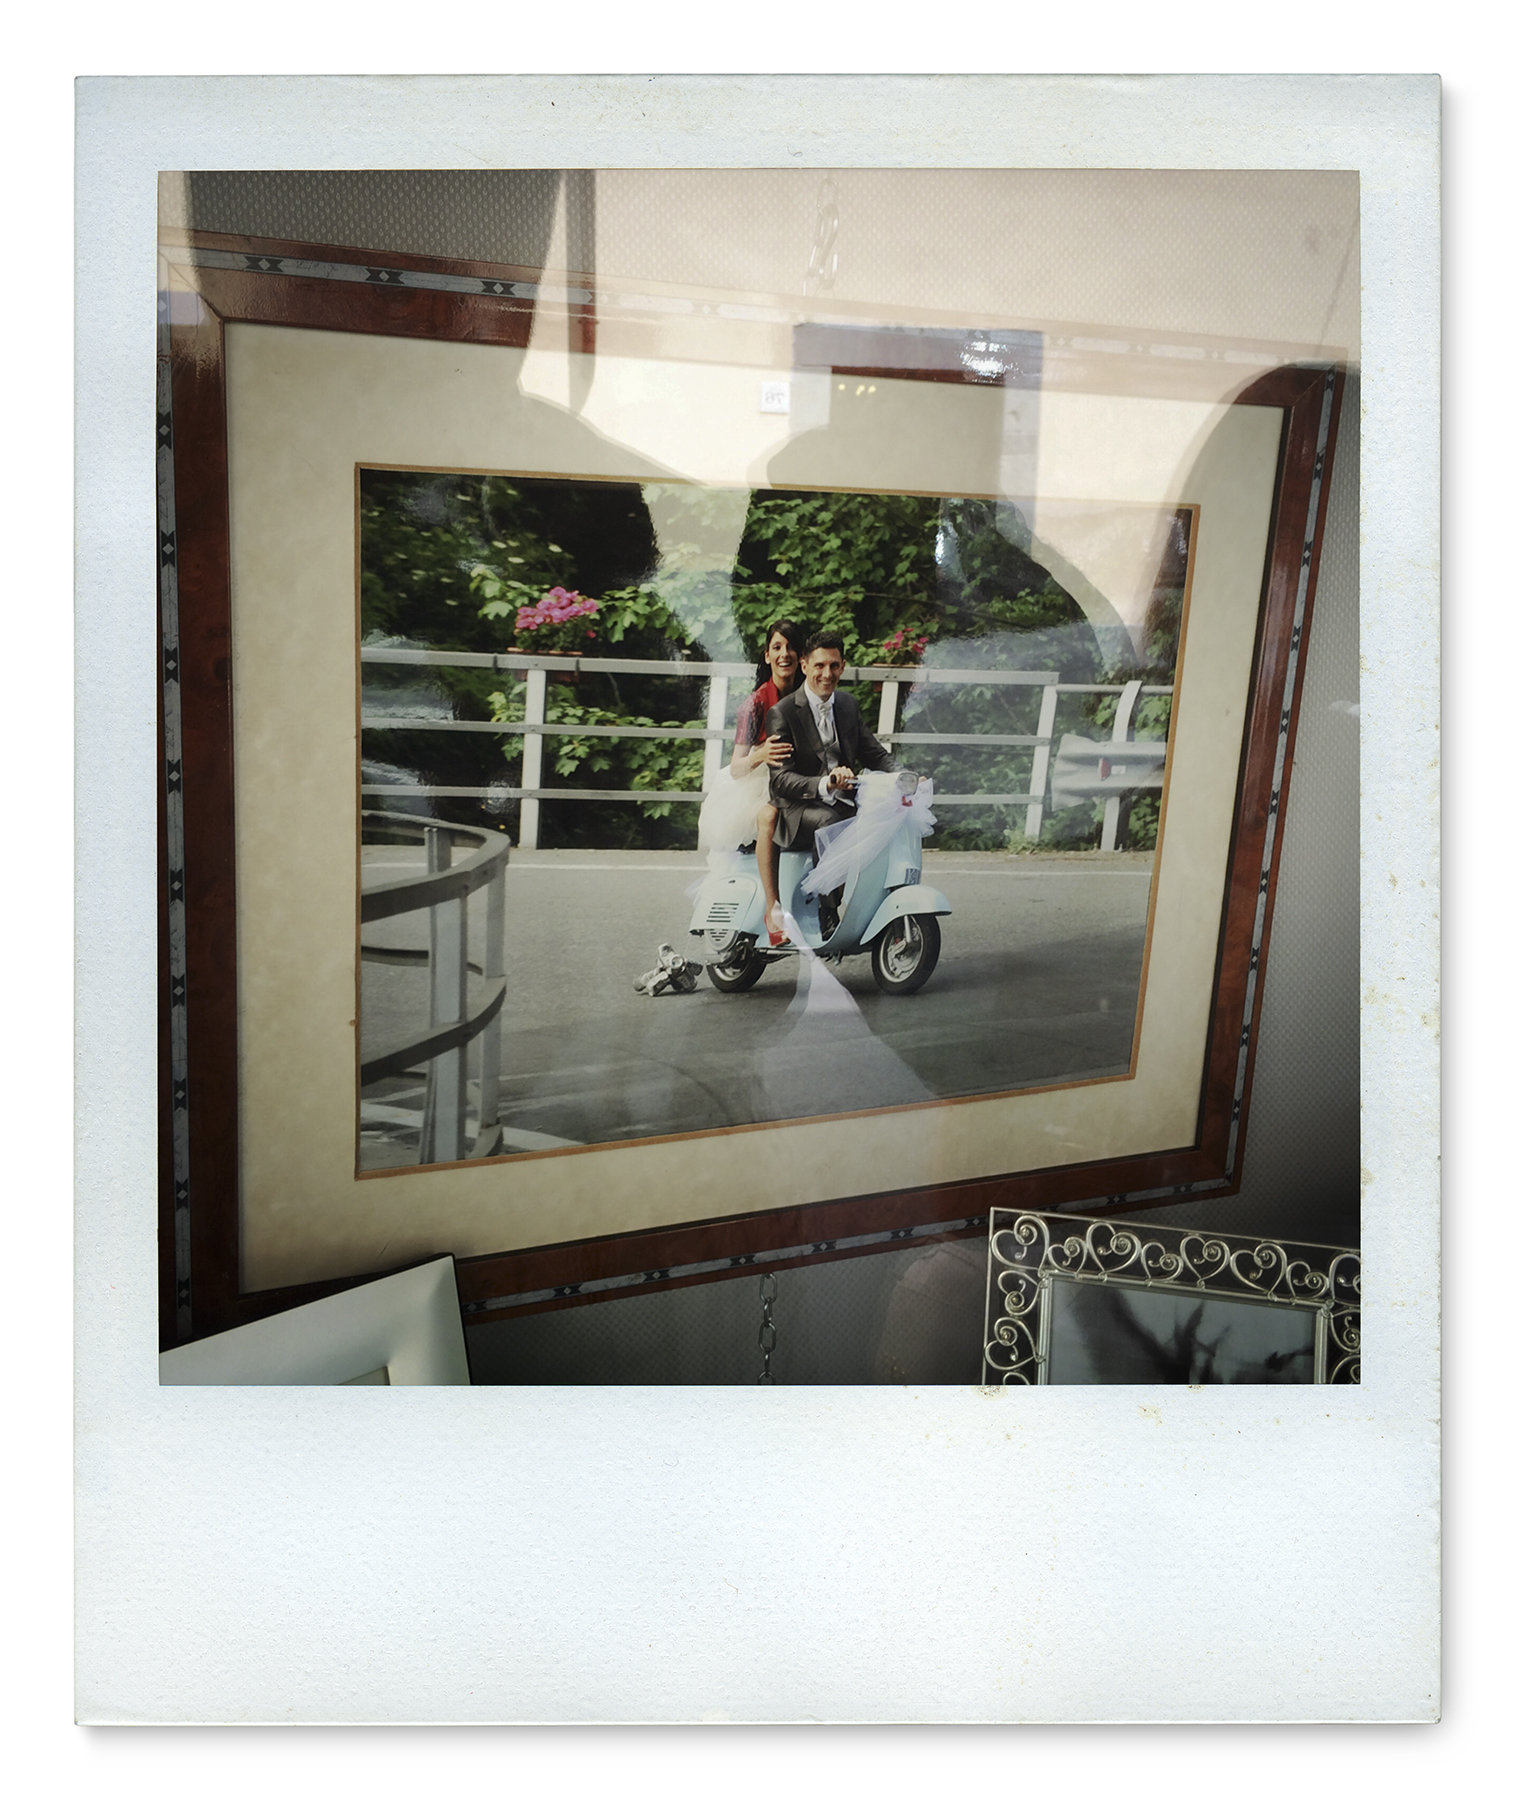 022_Polaroid SX70_IMG_2647.jpg